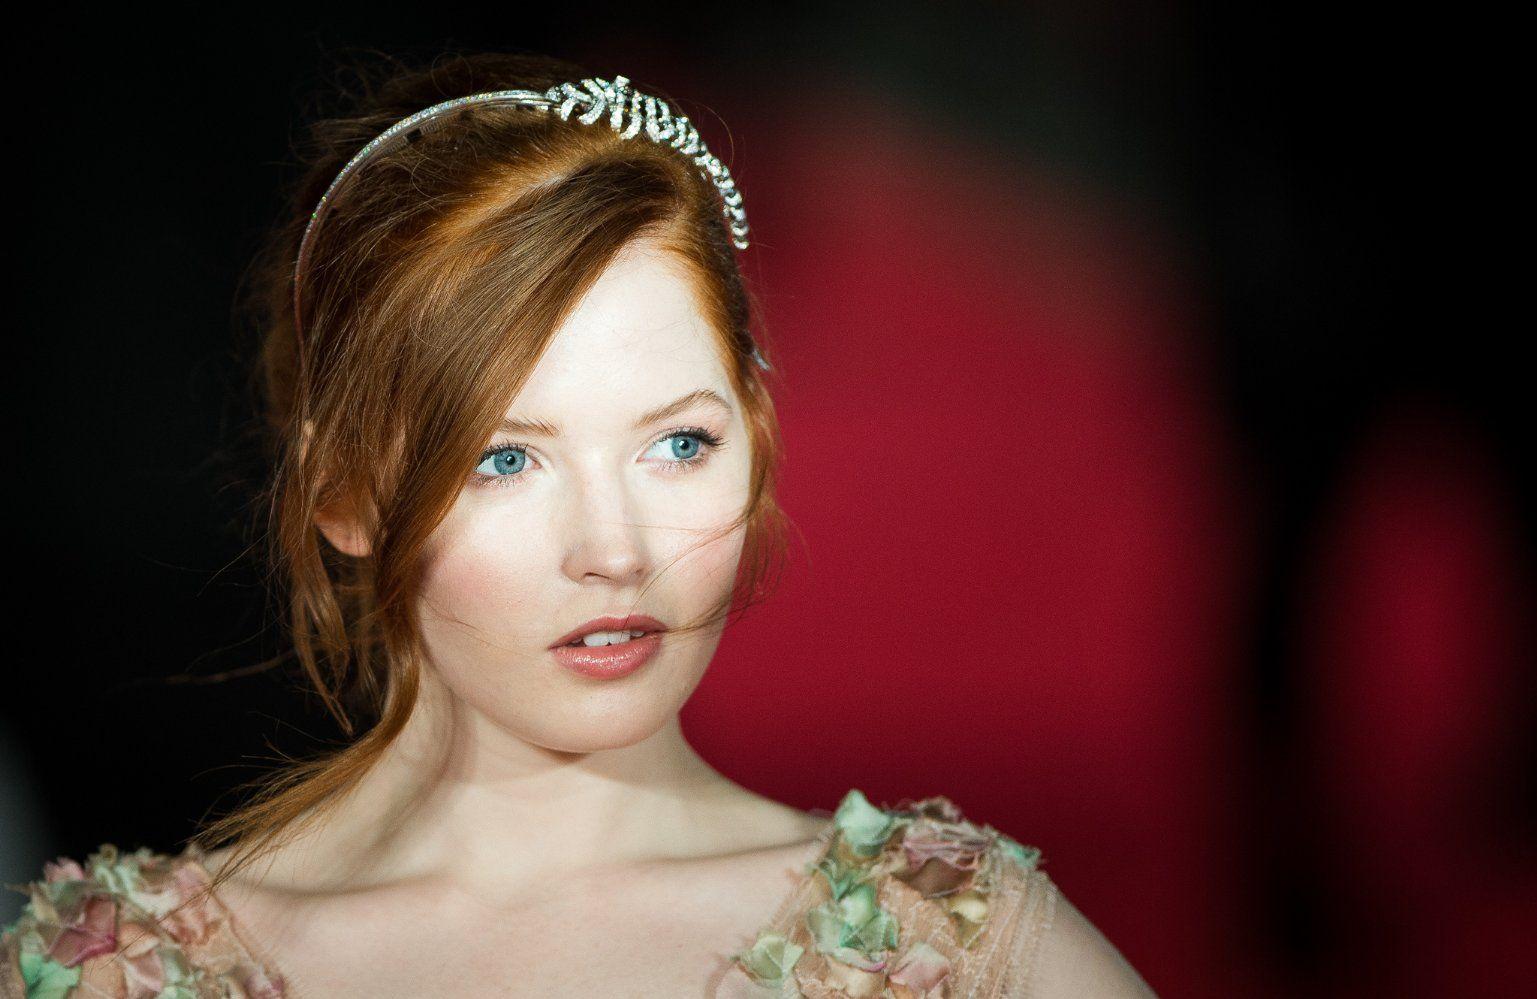 Ellie Bamber Actress Nocturnal Animals Born Eleanor